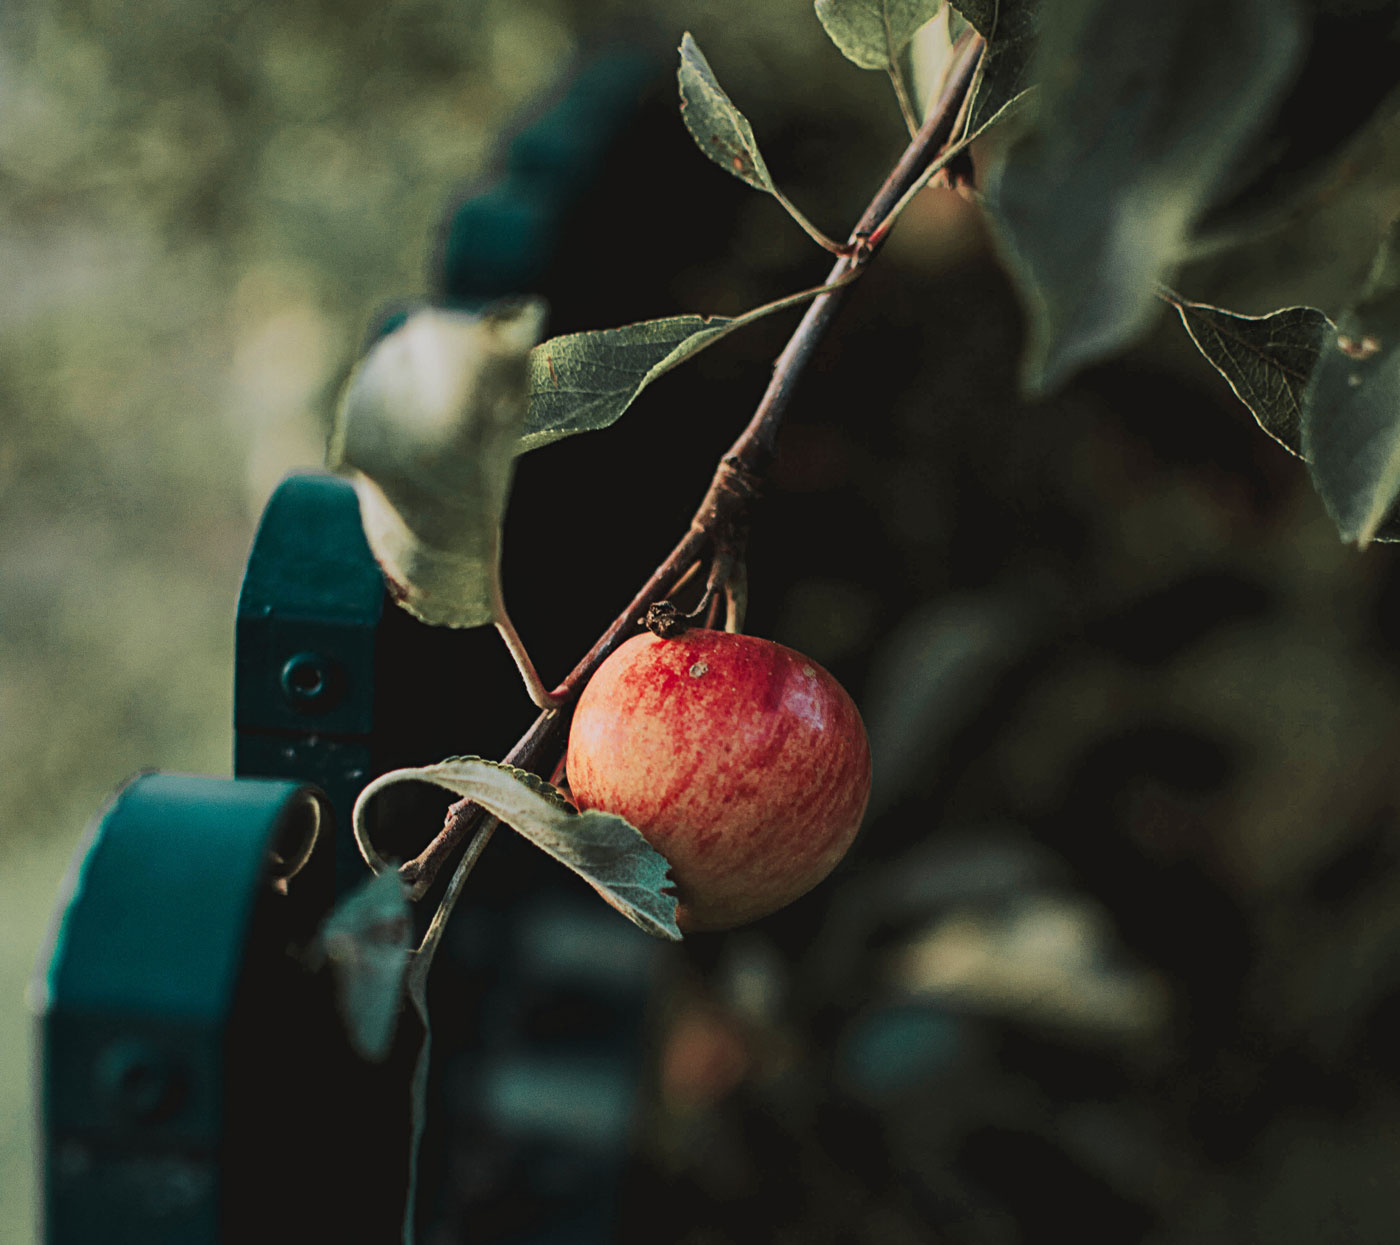 apple-apple-tree-branch-1425358